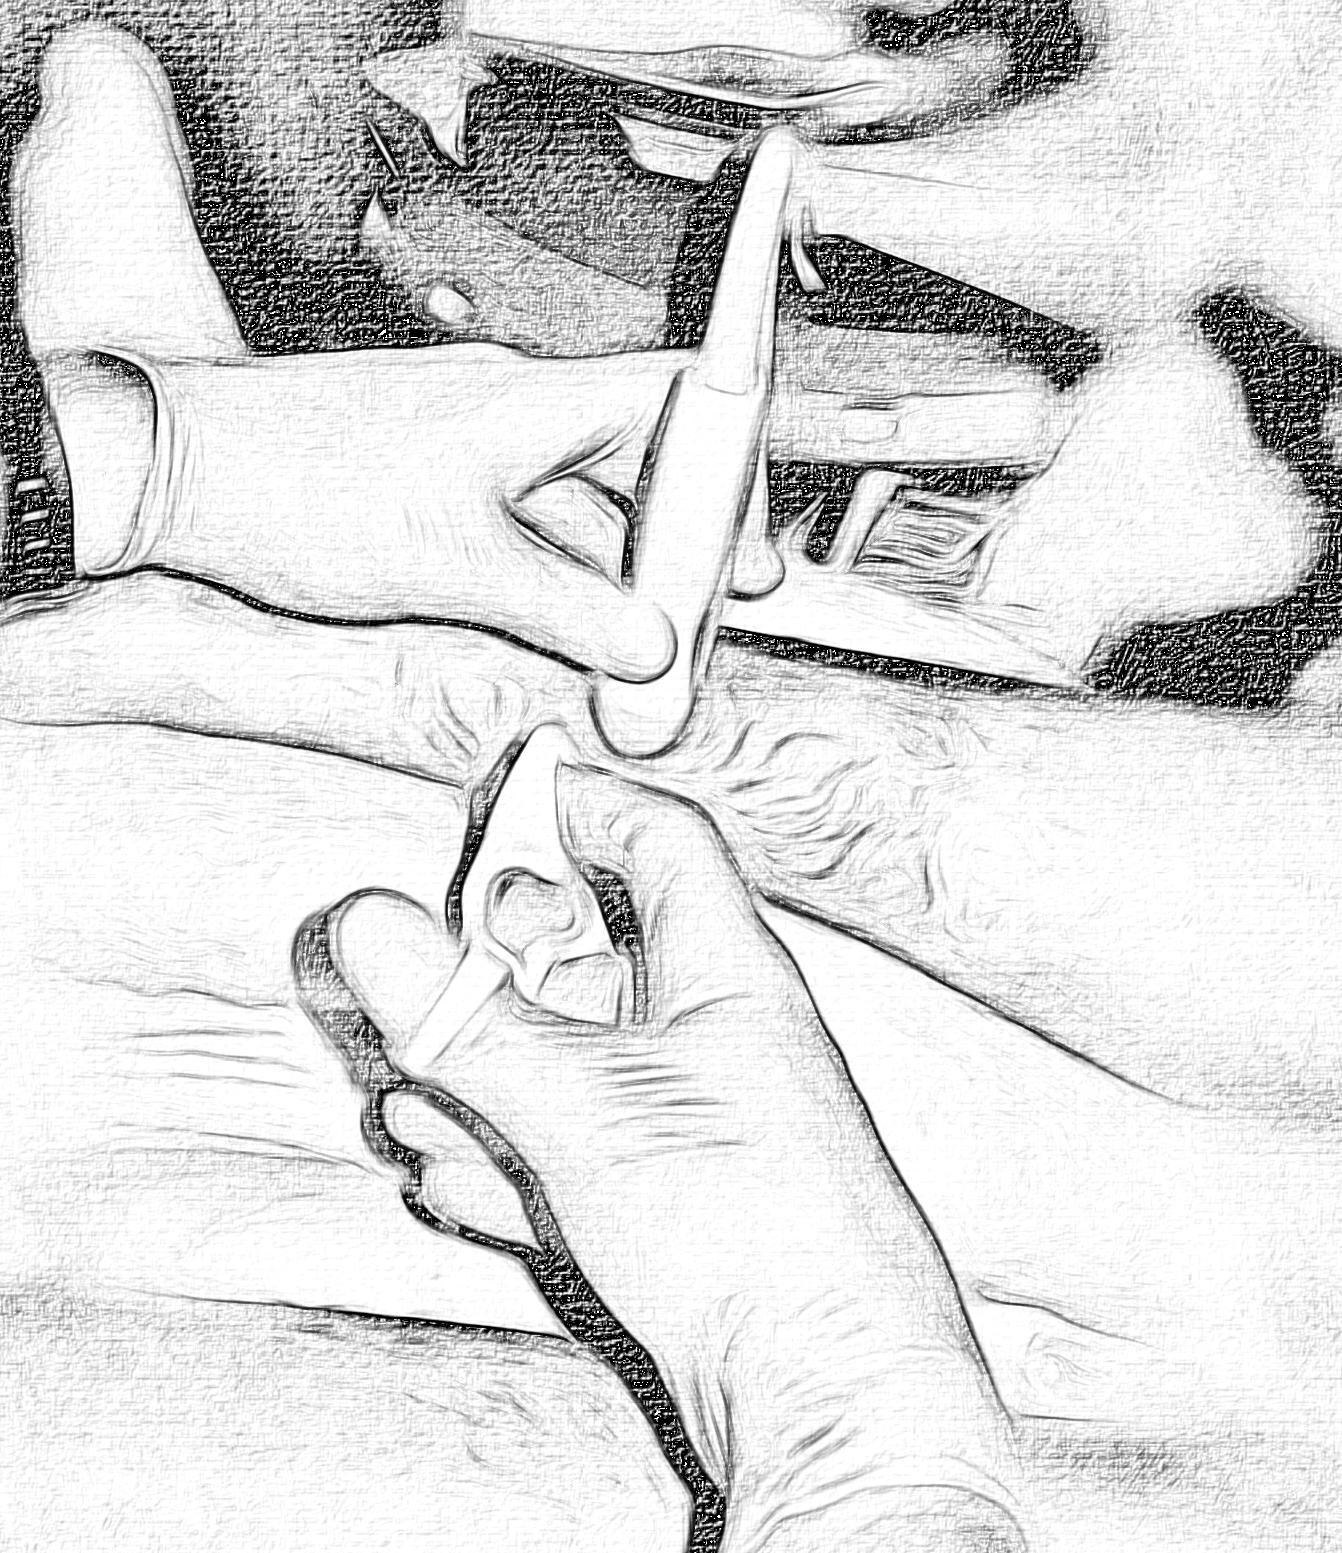 sketch hand detail posterior tibial.jpg